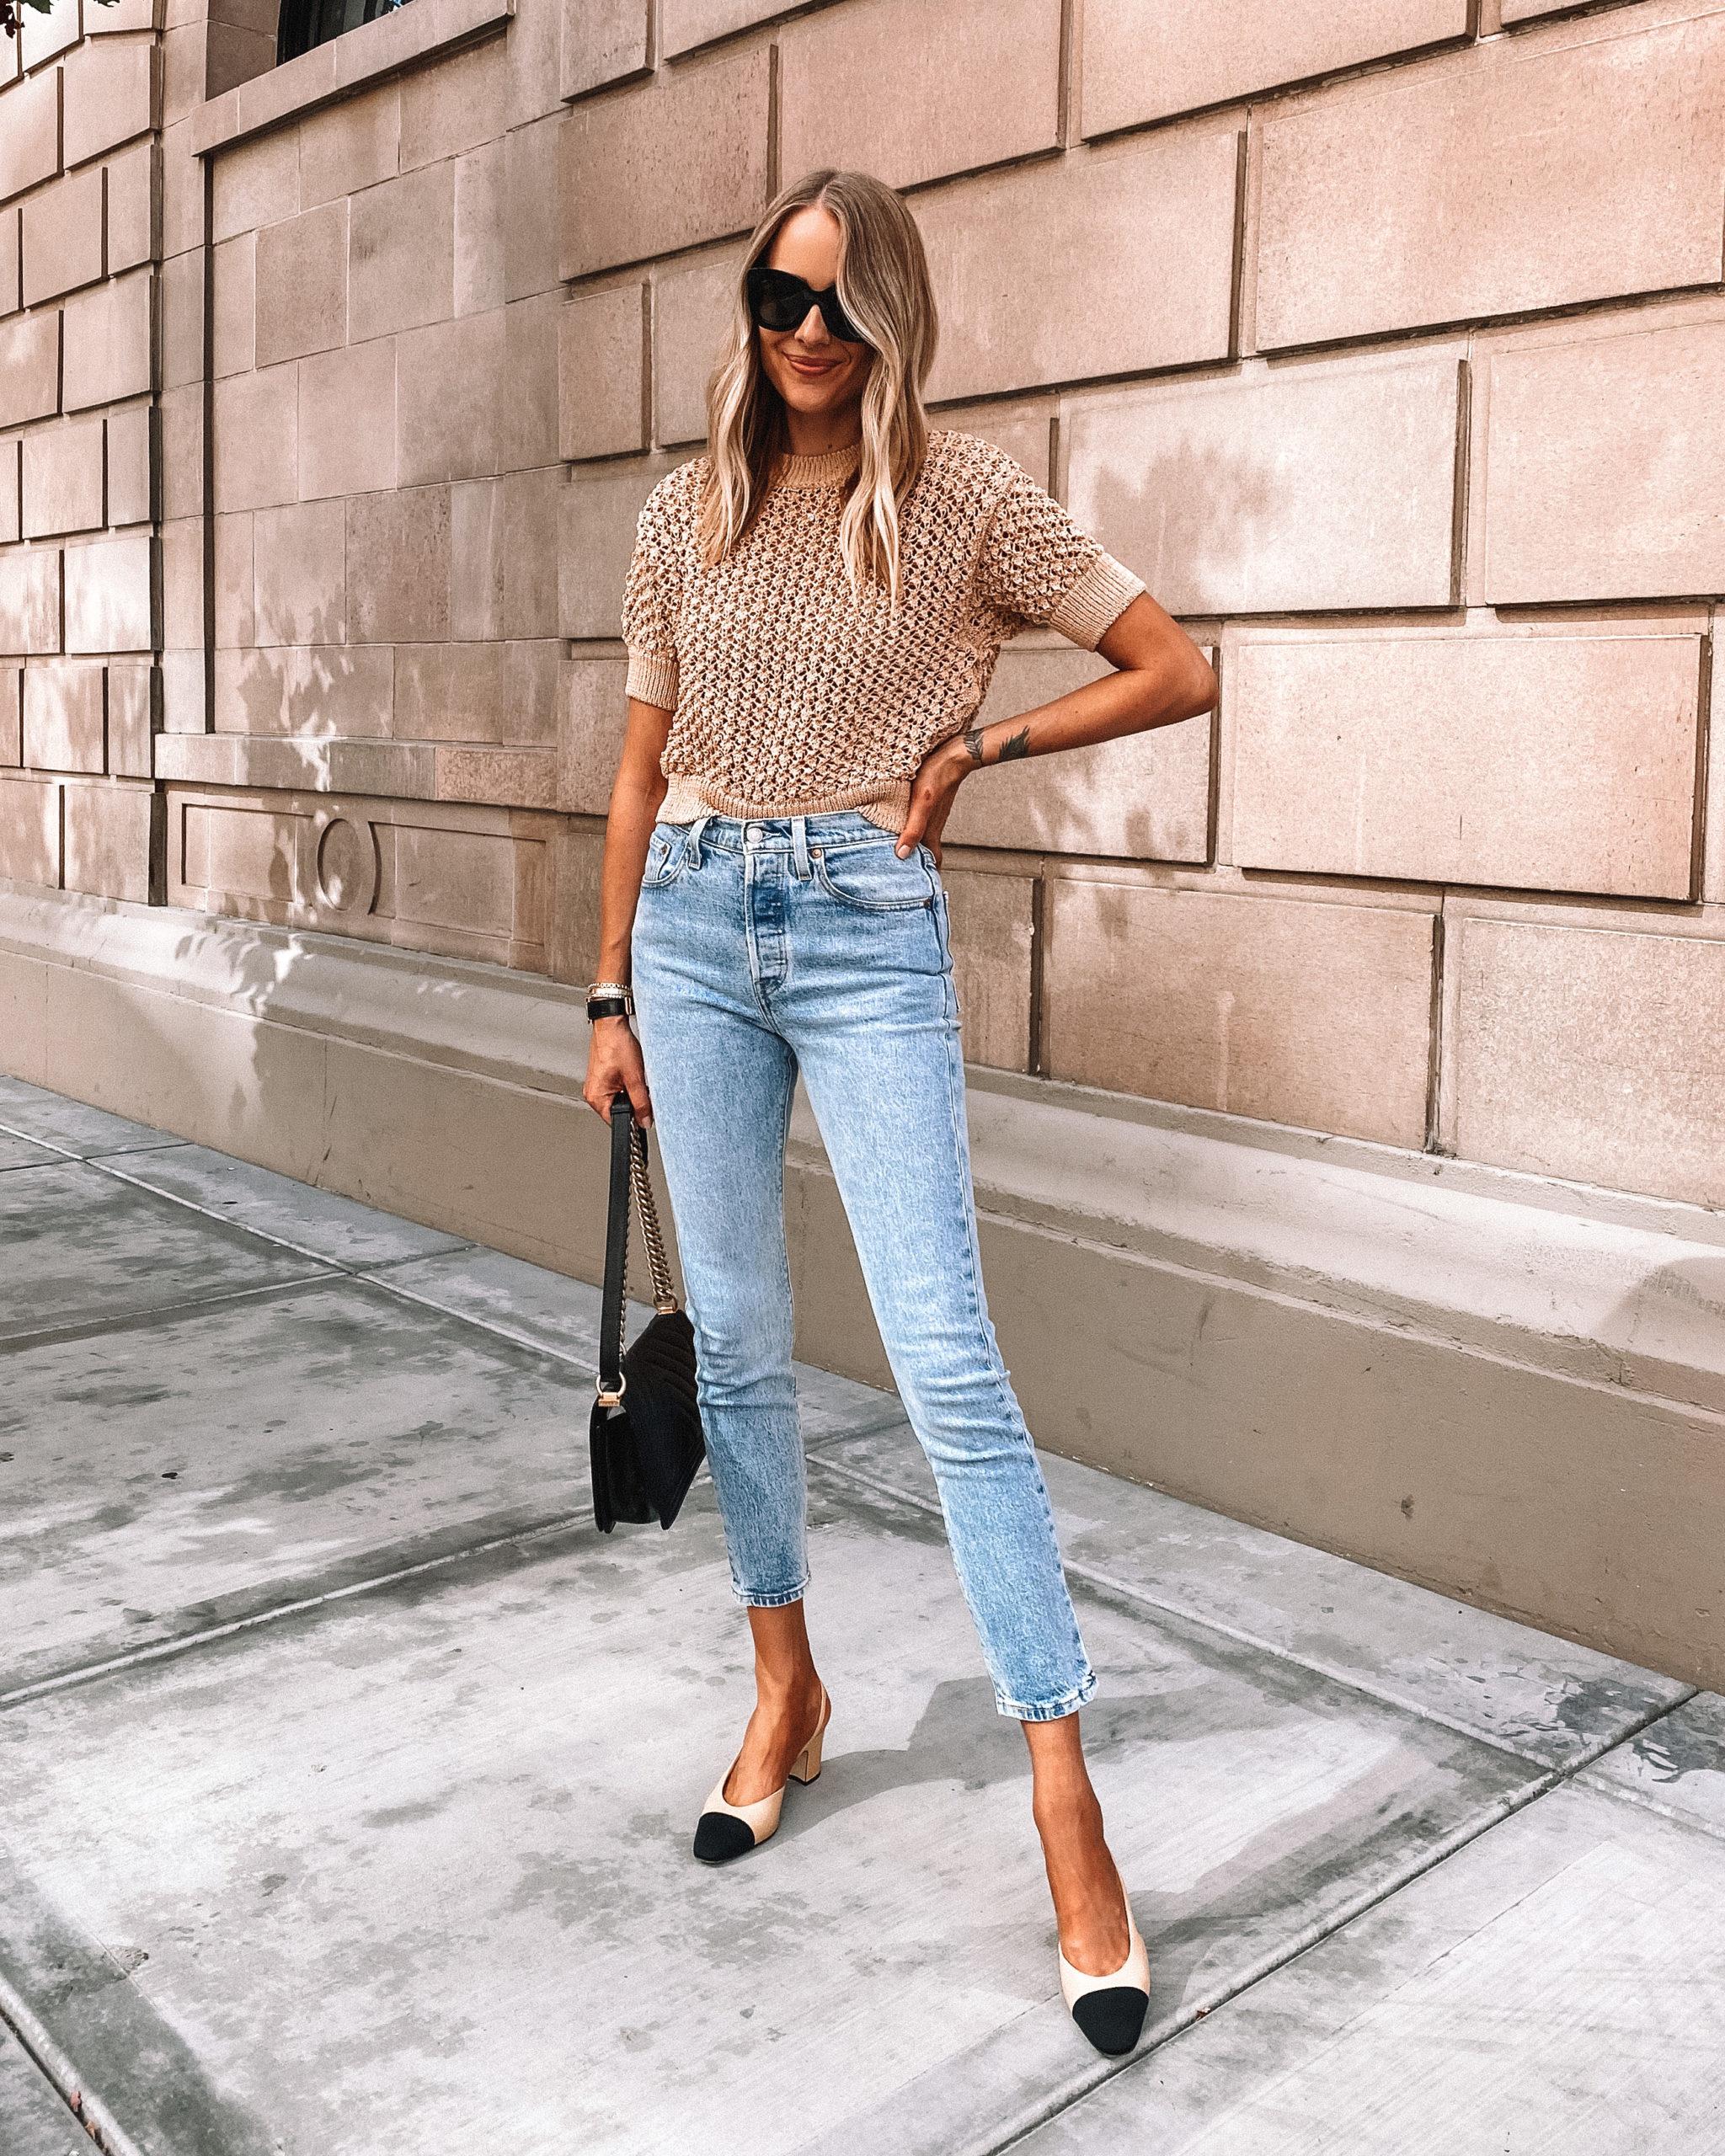 Fashion Jackson Wearing Mango Textured Sweater Levis 501 Jeans Chanel Slingbacks